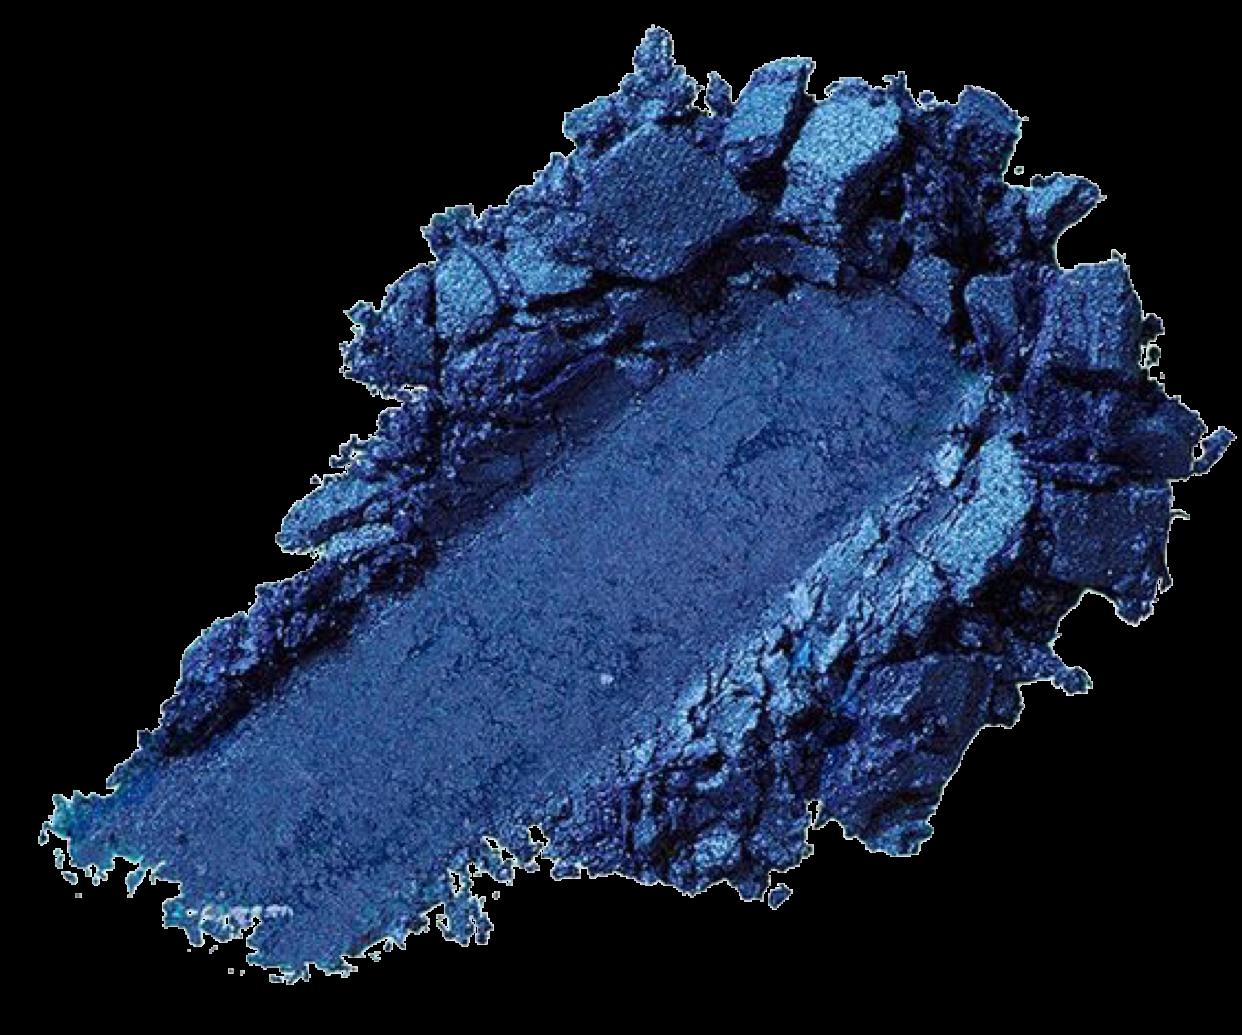 Pin by annika esselstrom on pngs Blue eyeshadow, Blue